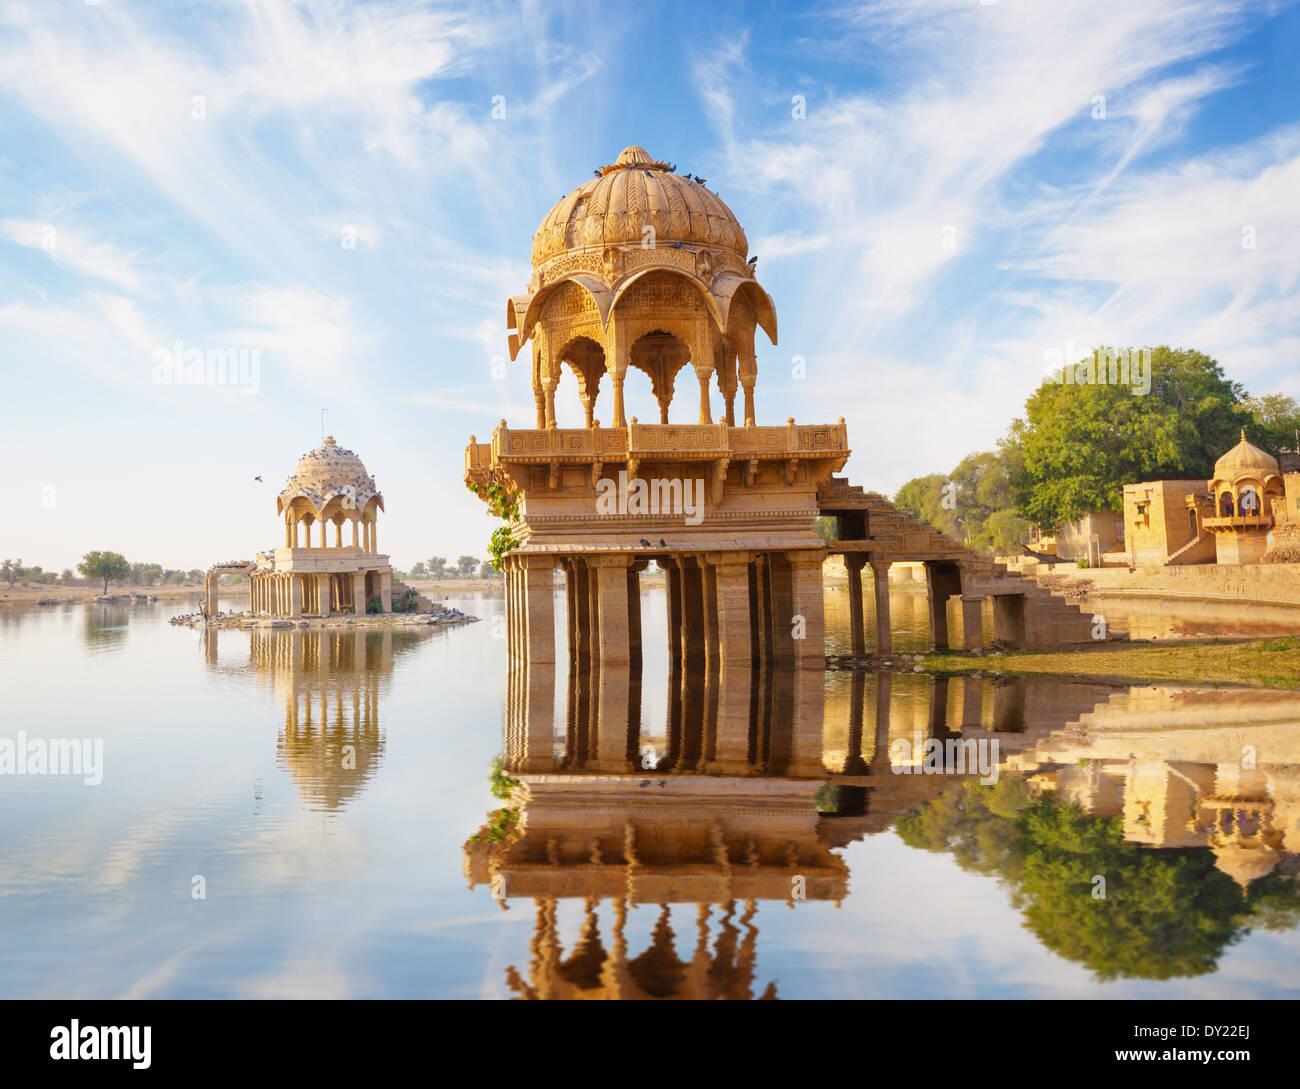 Indian landmarks - Gadi Sagar temple on Gadisar lake - Jaisalmer, Rajasthan, north India Stock Photo